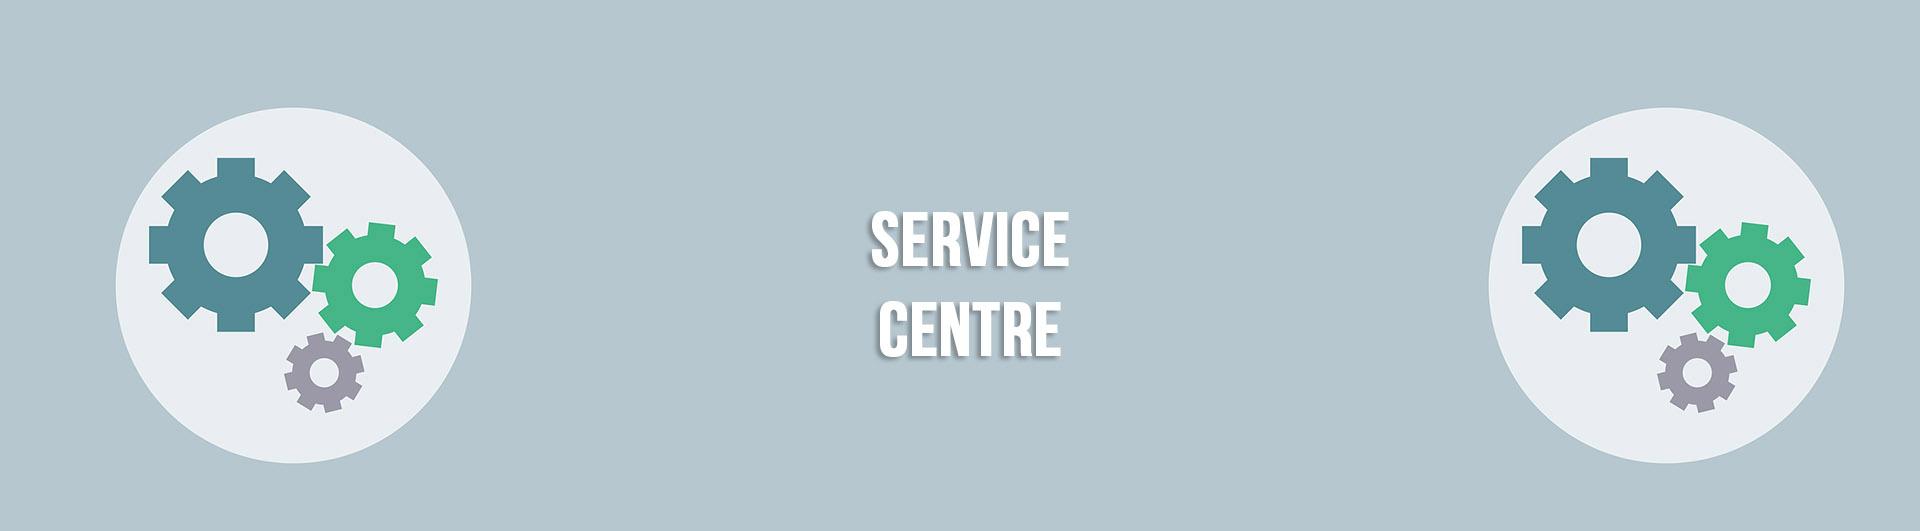 Service-Centre-1-1